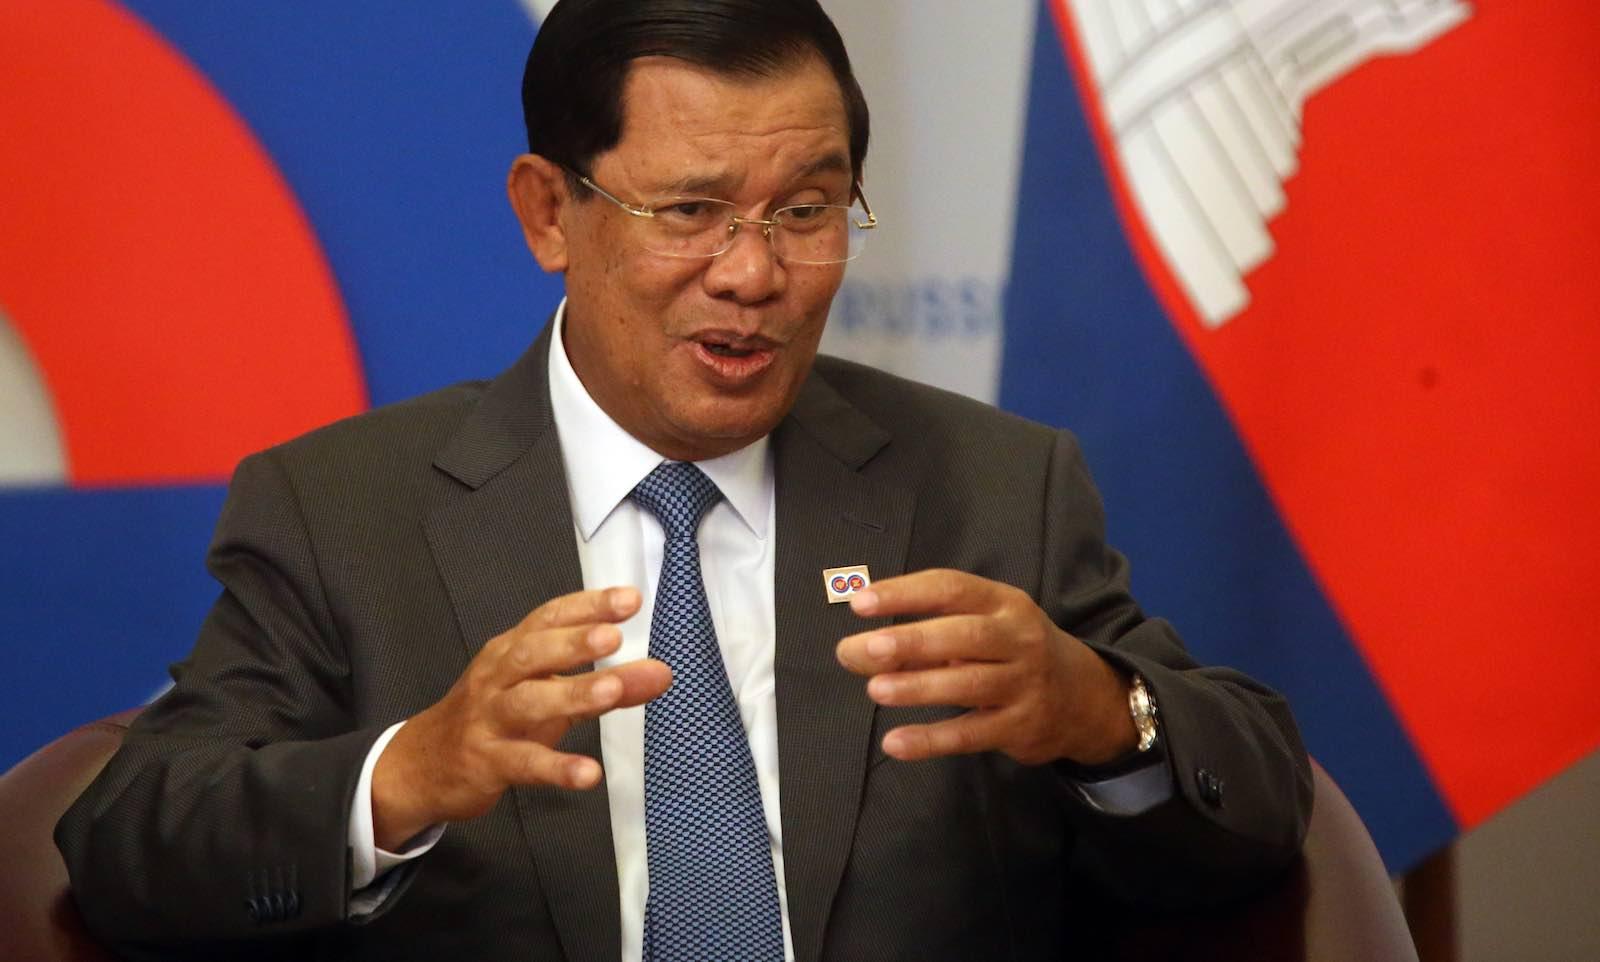 Cambodian Prime Minister Hun Sen (Photo: Mikhail Svetlov/Getty)